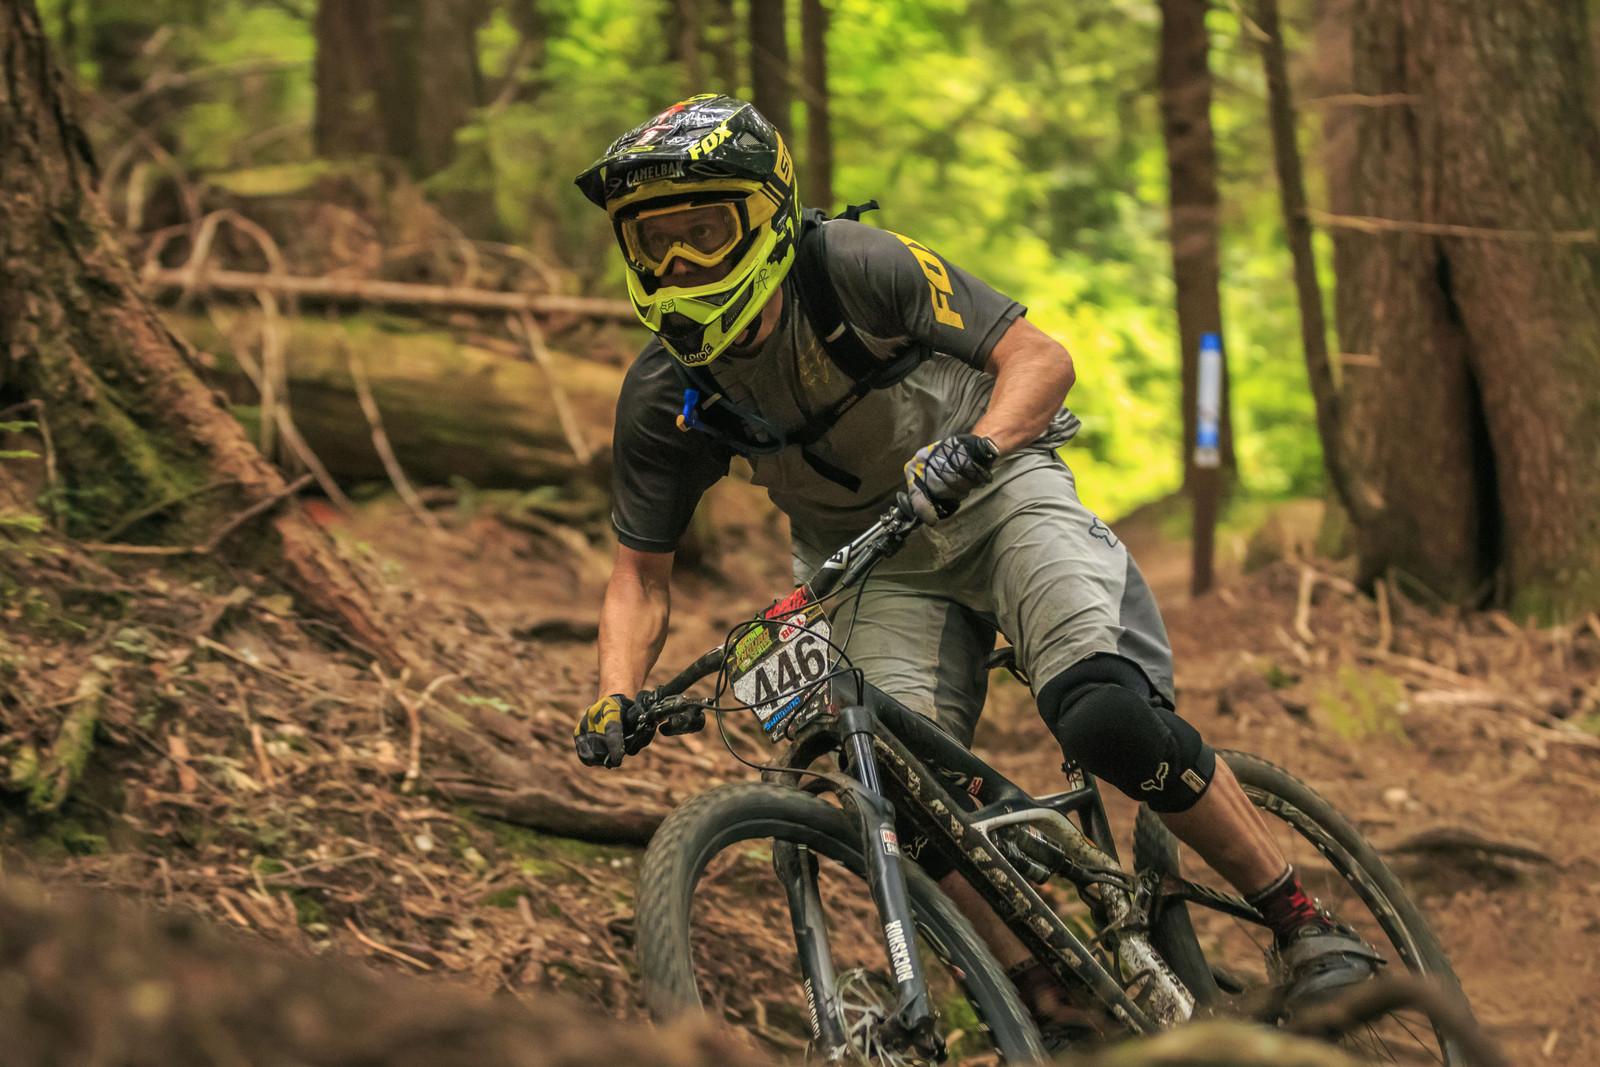 Kirt Voreis, Winner of the Oregon Enduro, Cold Creek - 2014 Oregon Enduro, Cold Creek - Mountain Biking Pictures - Vital MTB